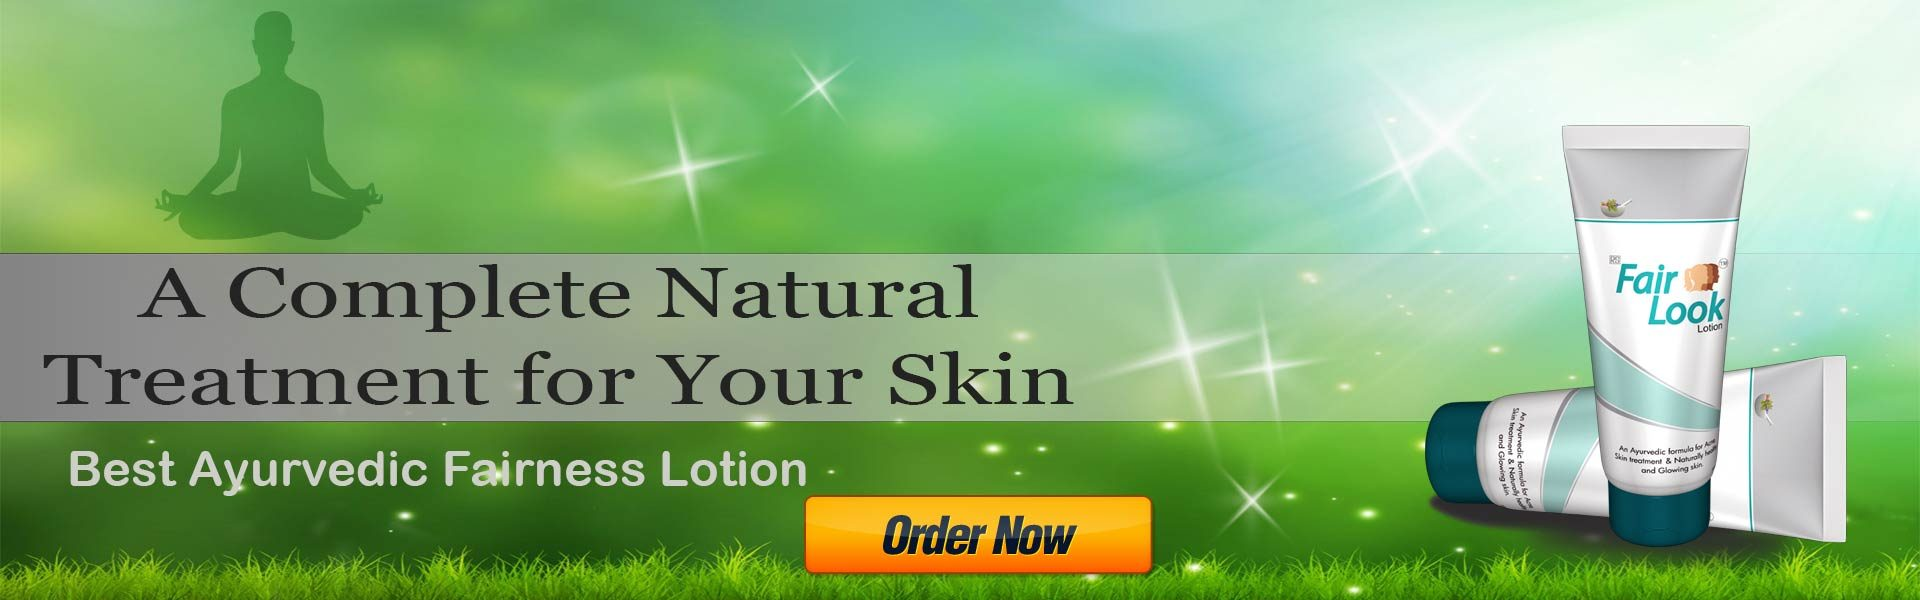 Fairlook Natural Treatment